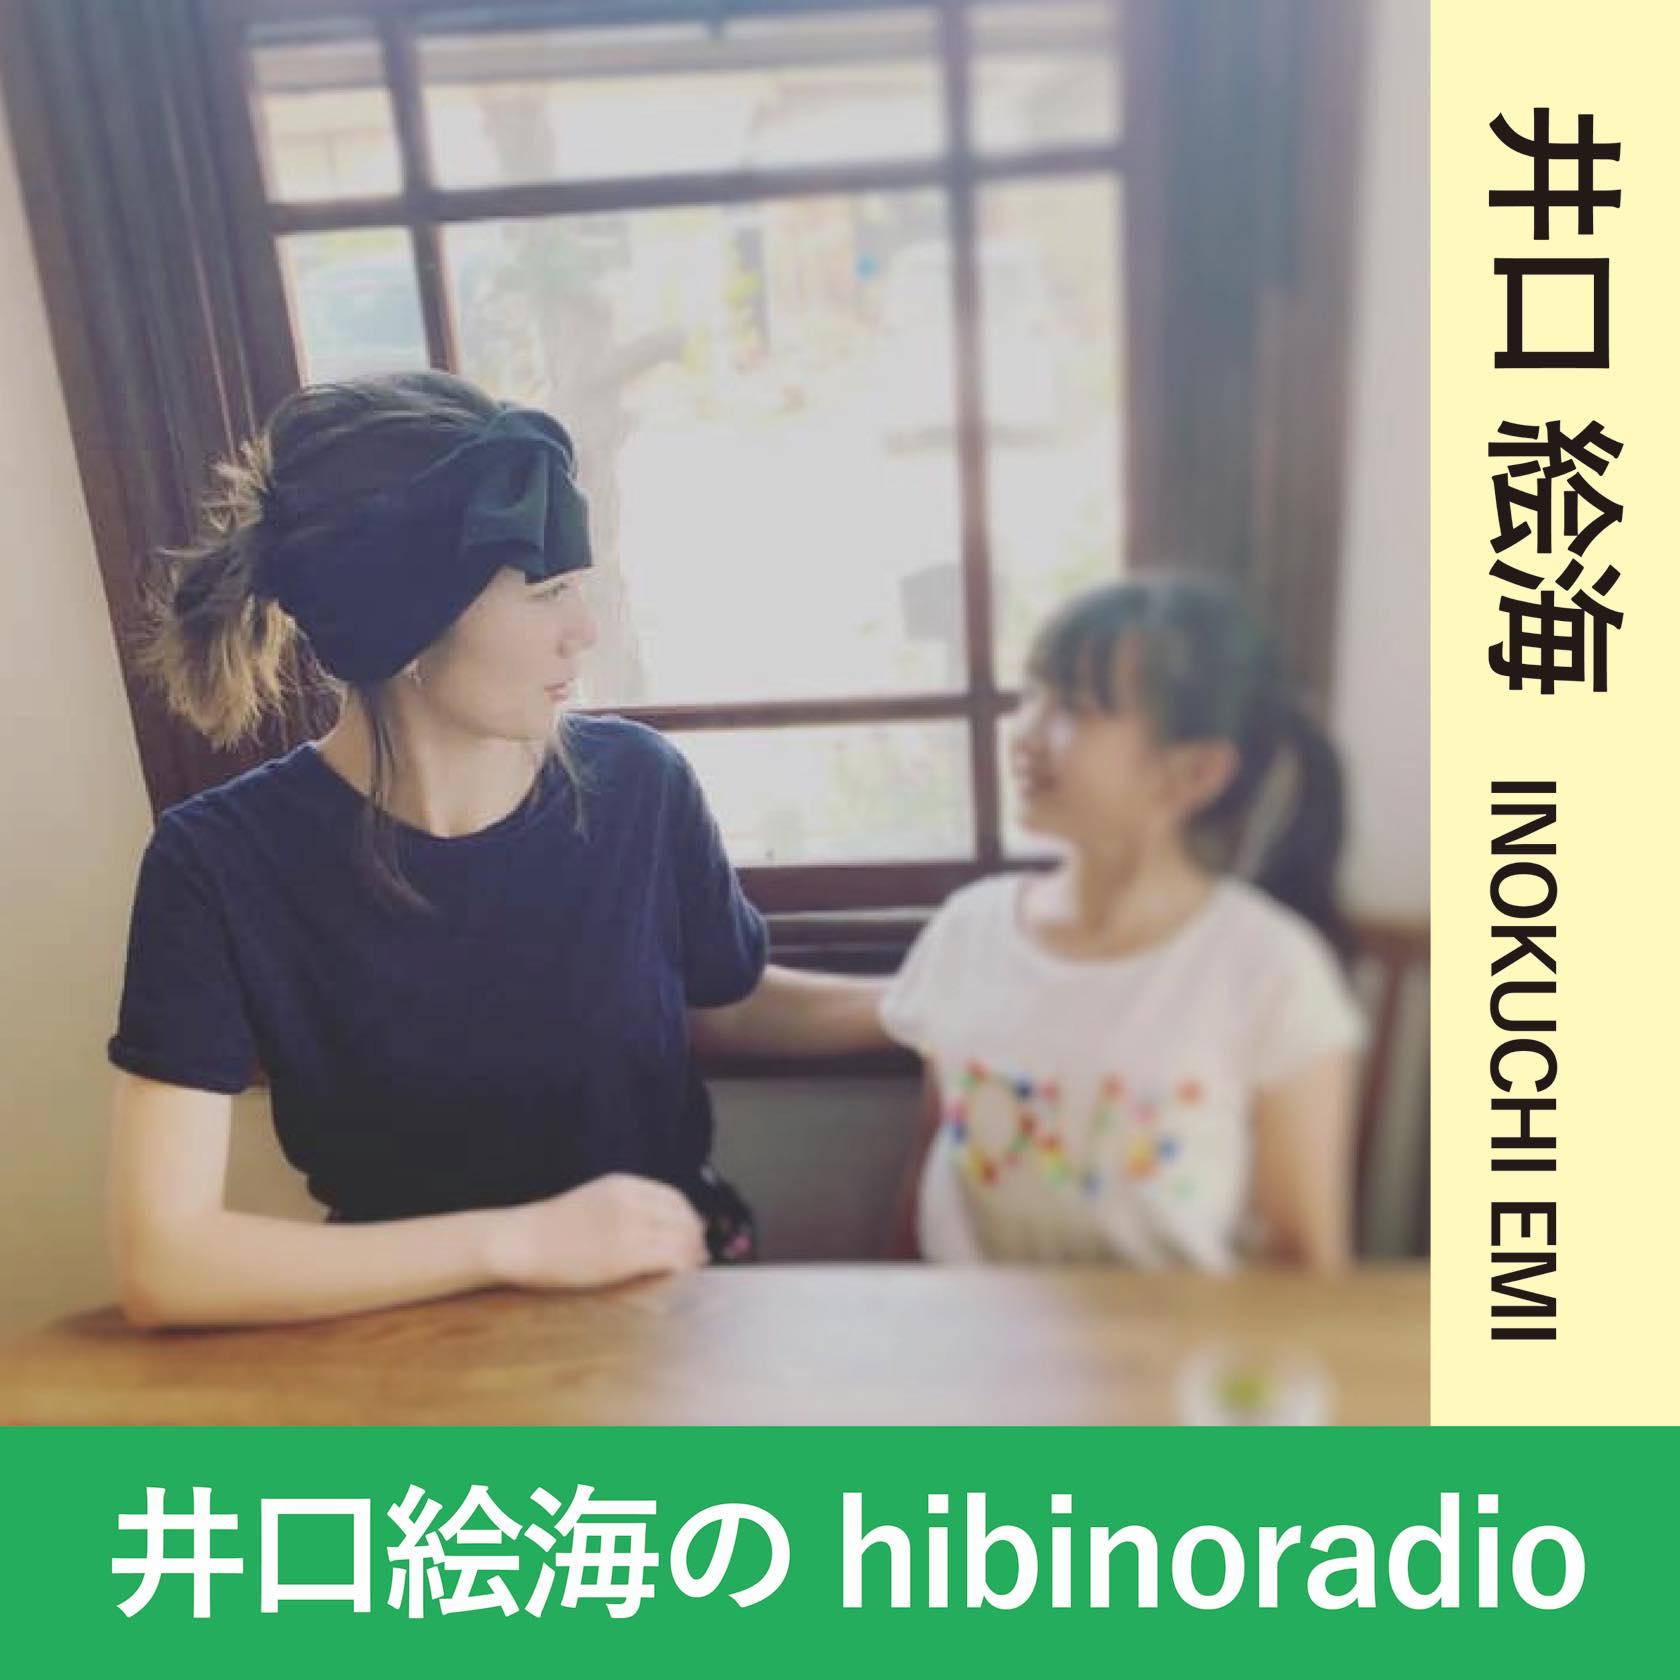 hibinoradioの番組表